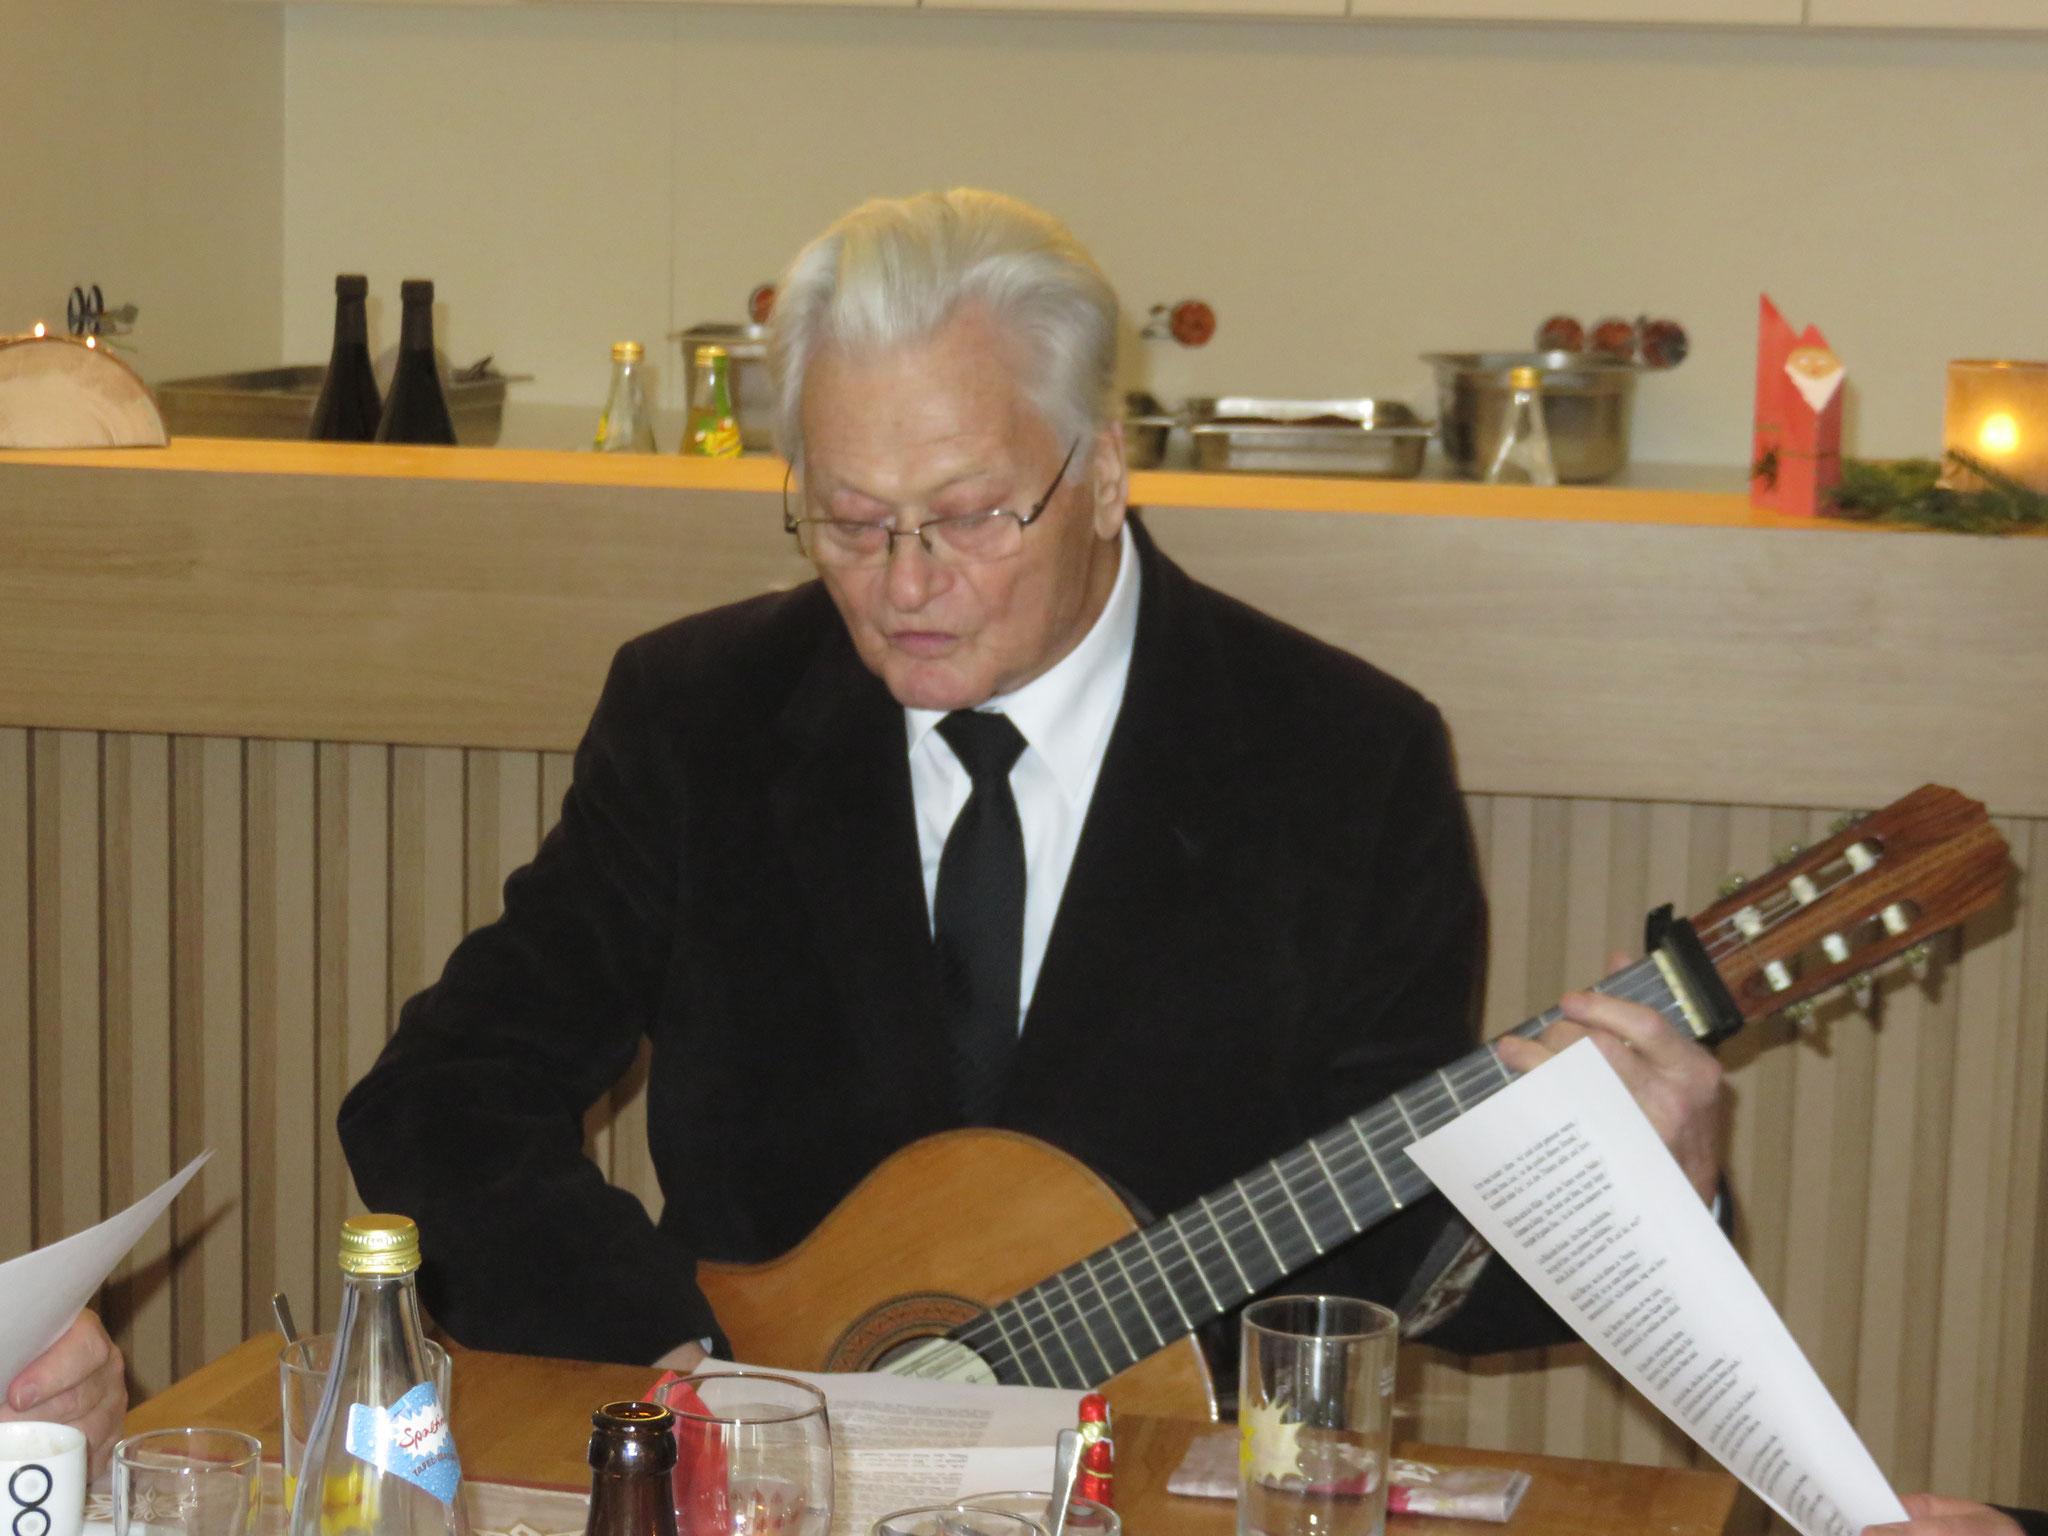 Pfarrer Wohlmuth stimmt das Nikolauslied an.